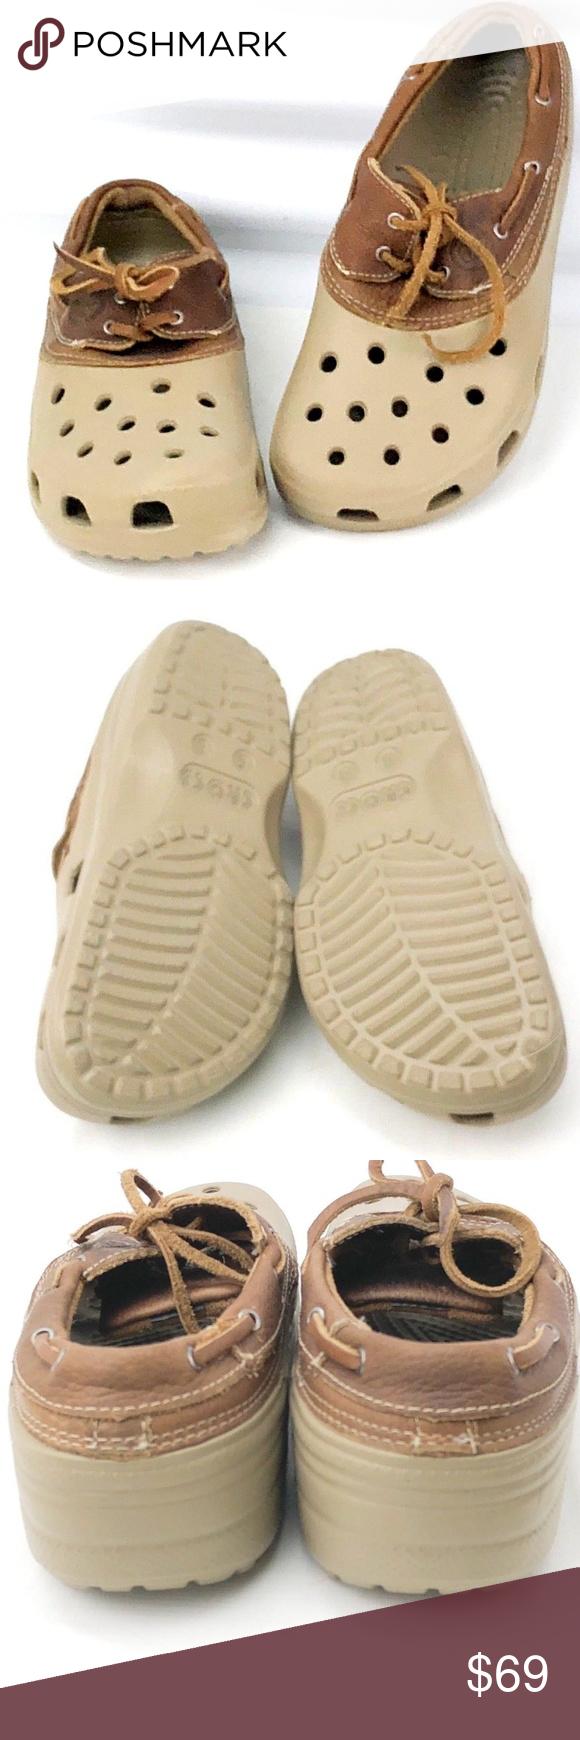 20c71fafb09236 I just added this listing on Poshmark  CROCS Tan Islander Pitcrew Sport Boat  Shoes.  shopmycloset  poshmark  fashion  shopping  style  forsale  crocs   Shoes